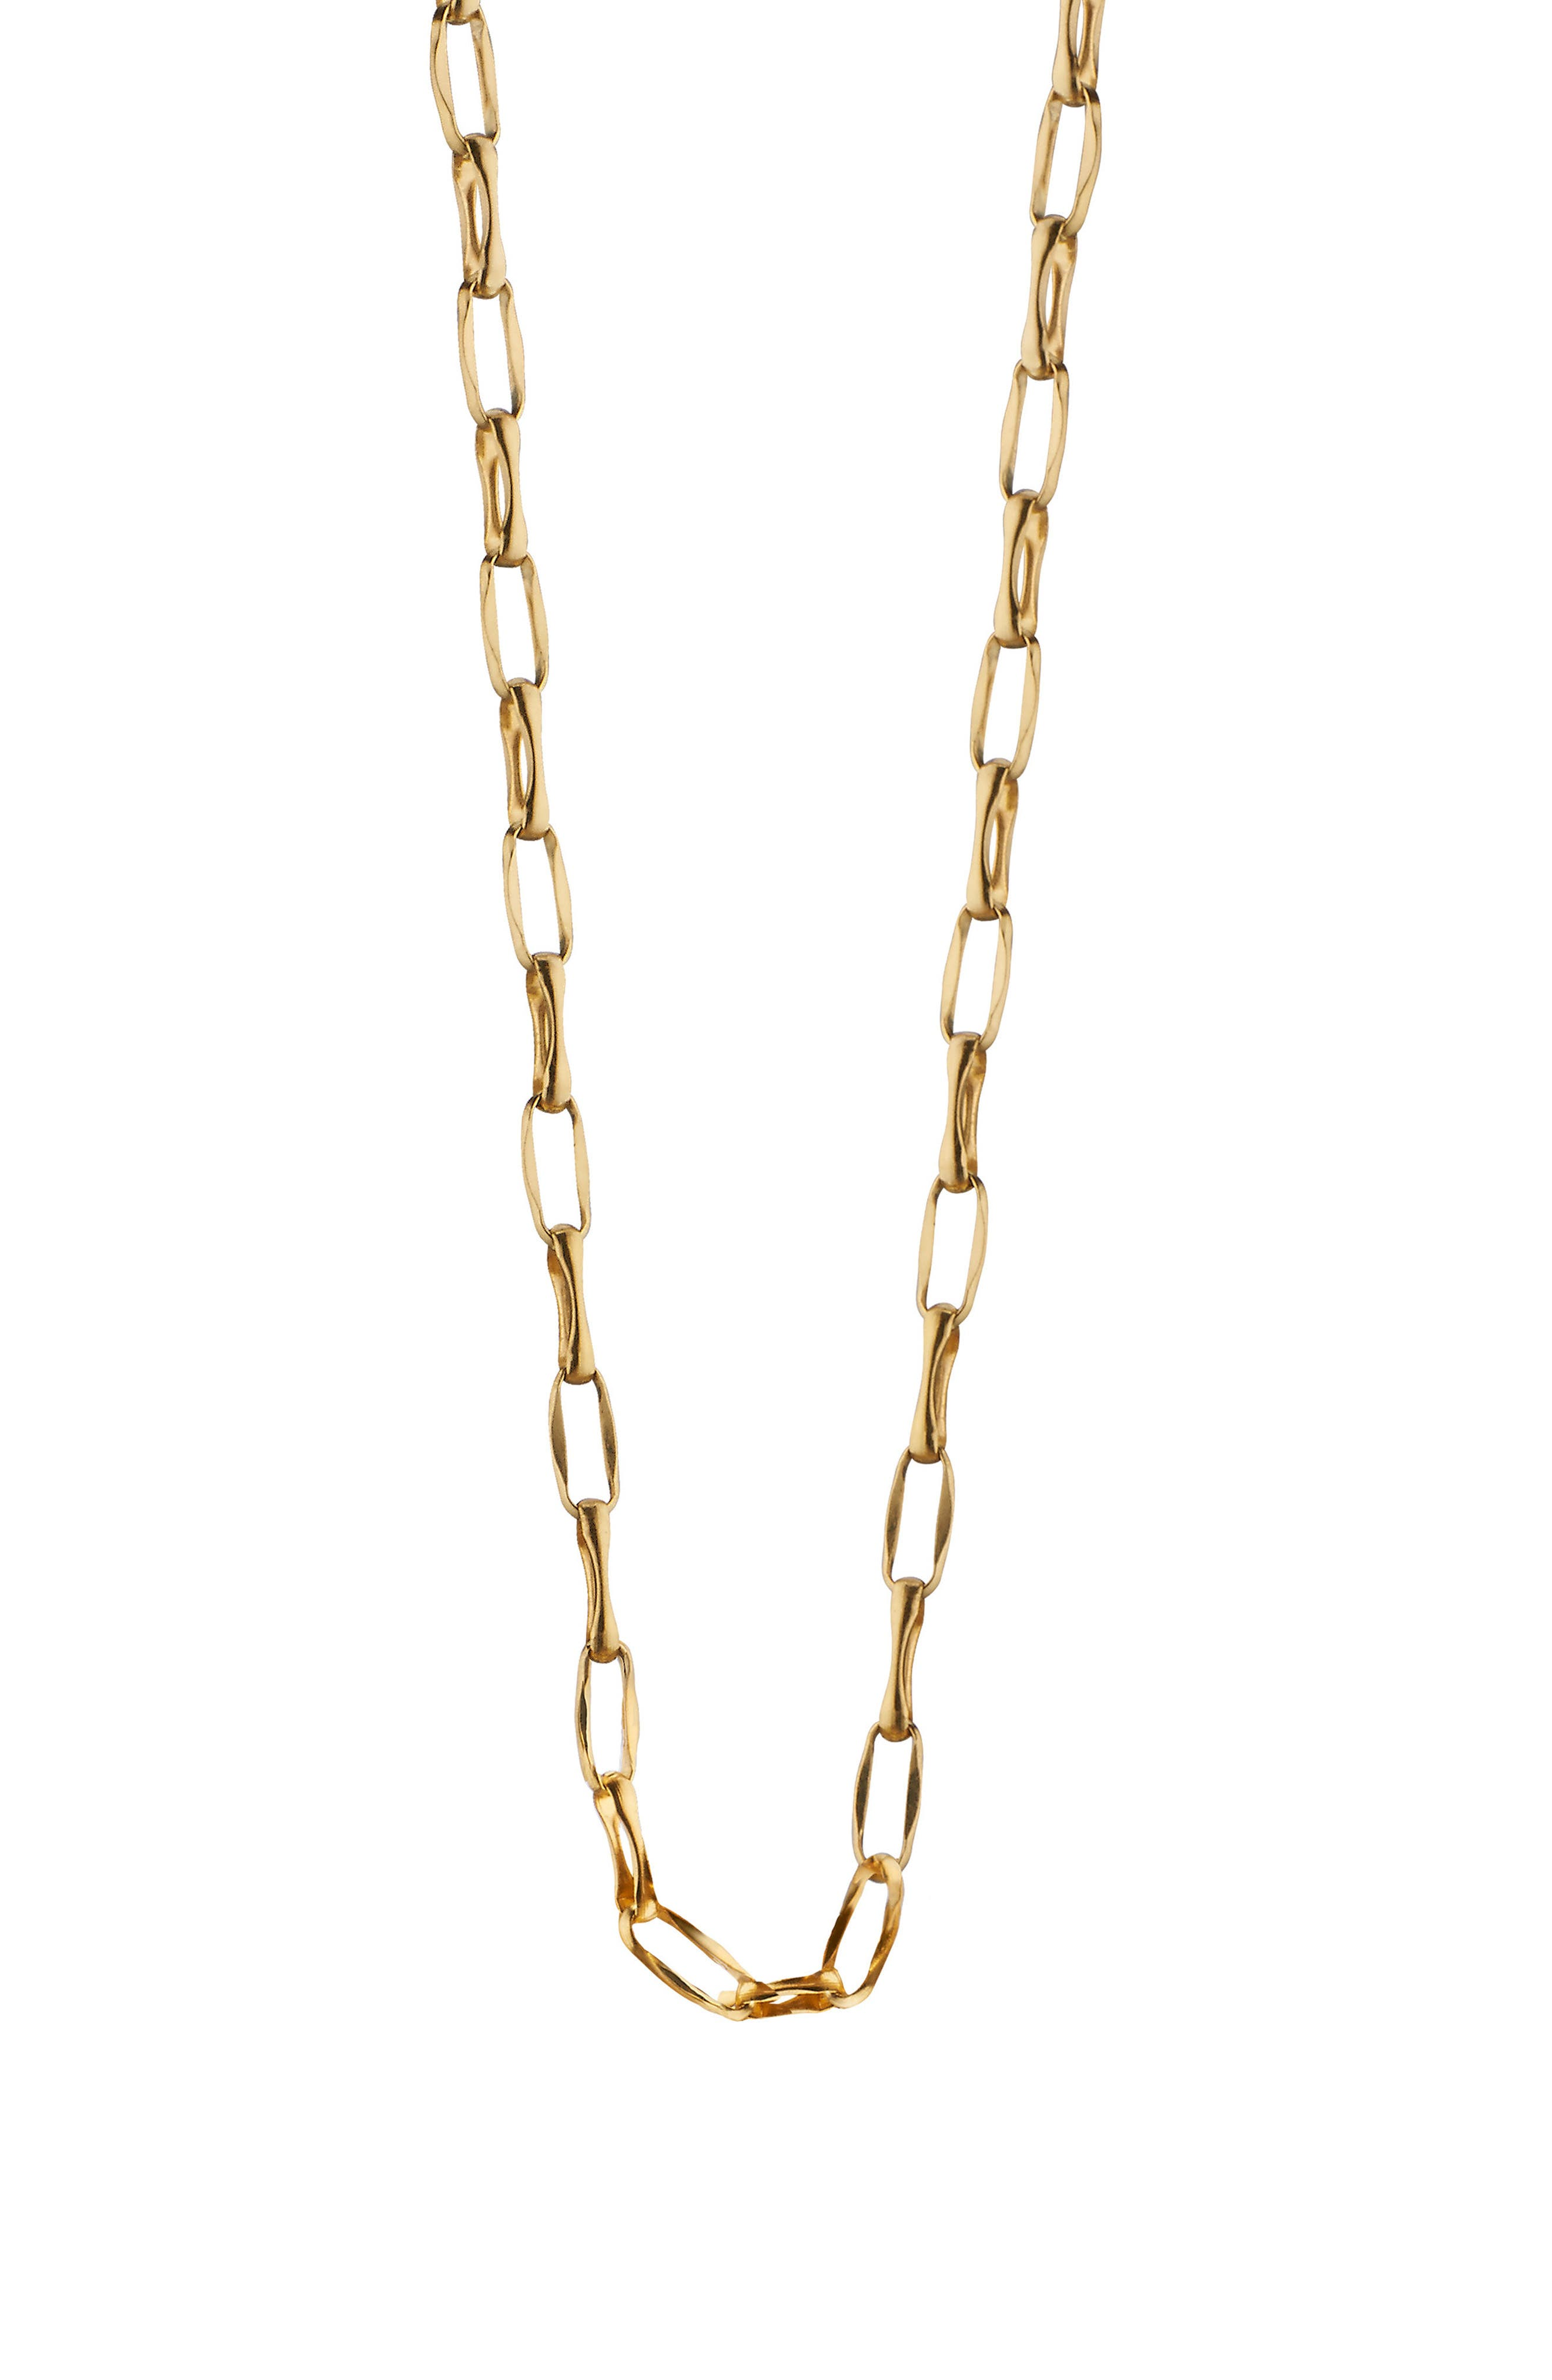 Belcher 18K Gold Chain,                             Main thumbnail 1, color,                             18K Yellow Gold